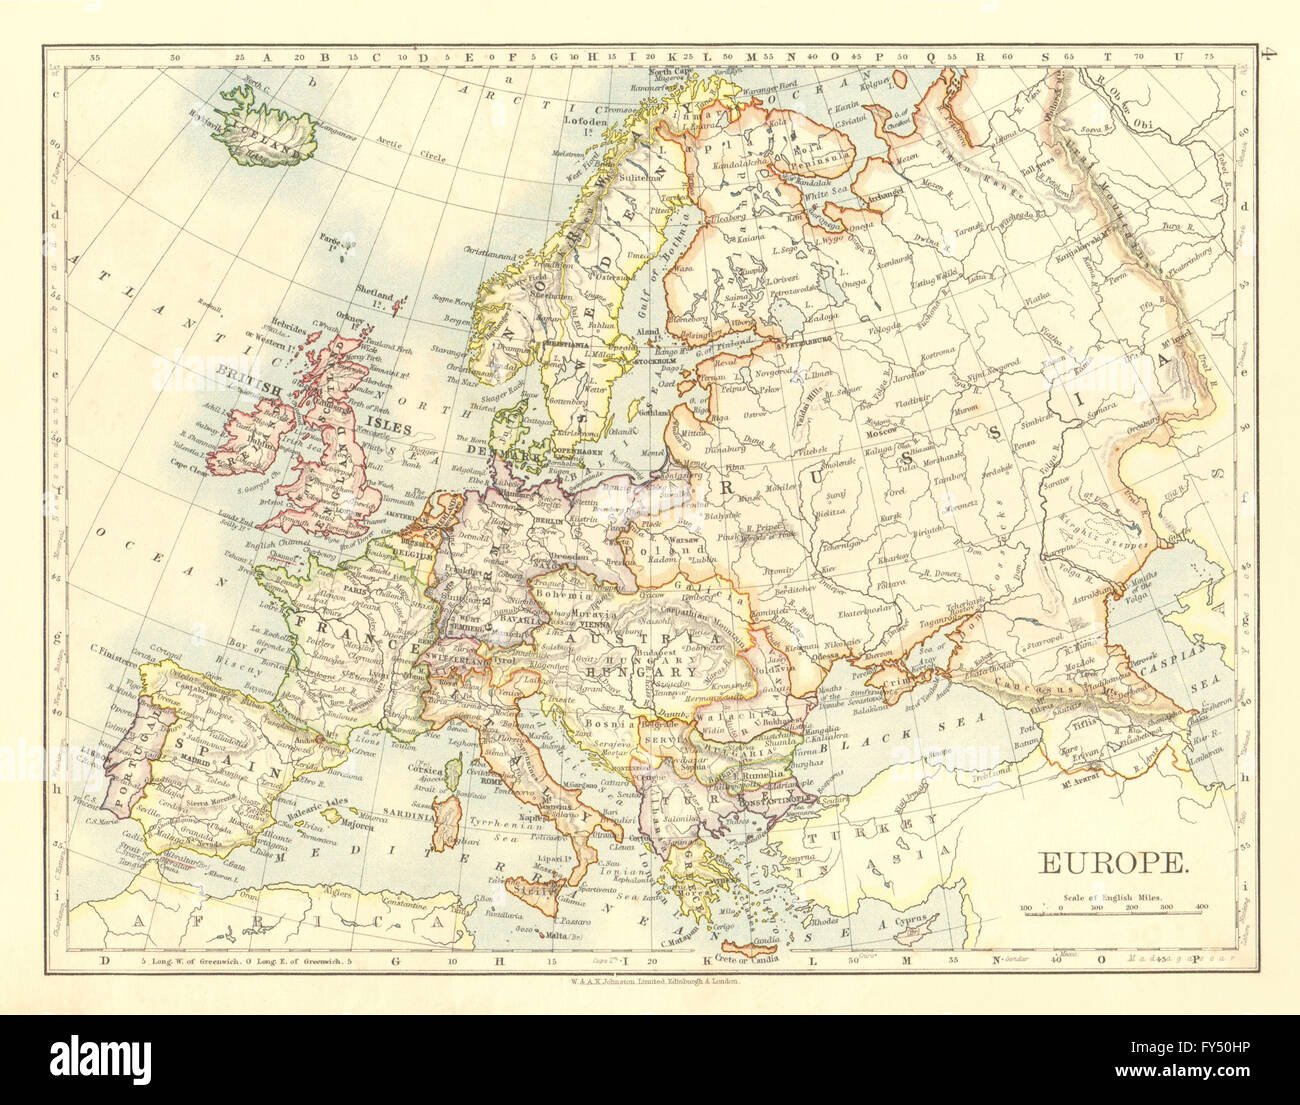 EUROPE POLITICAL AustriaHungary United Sweden Norway - Austria political map